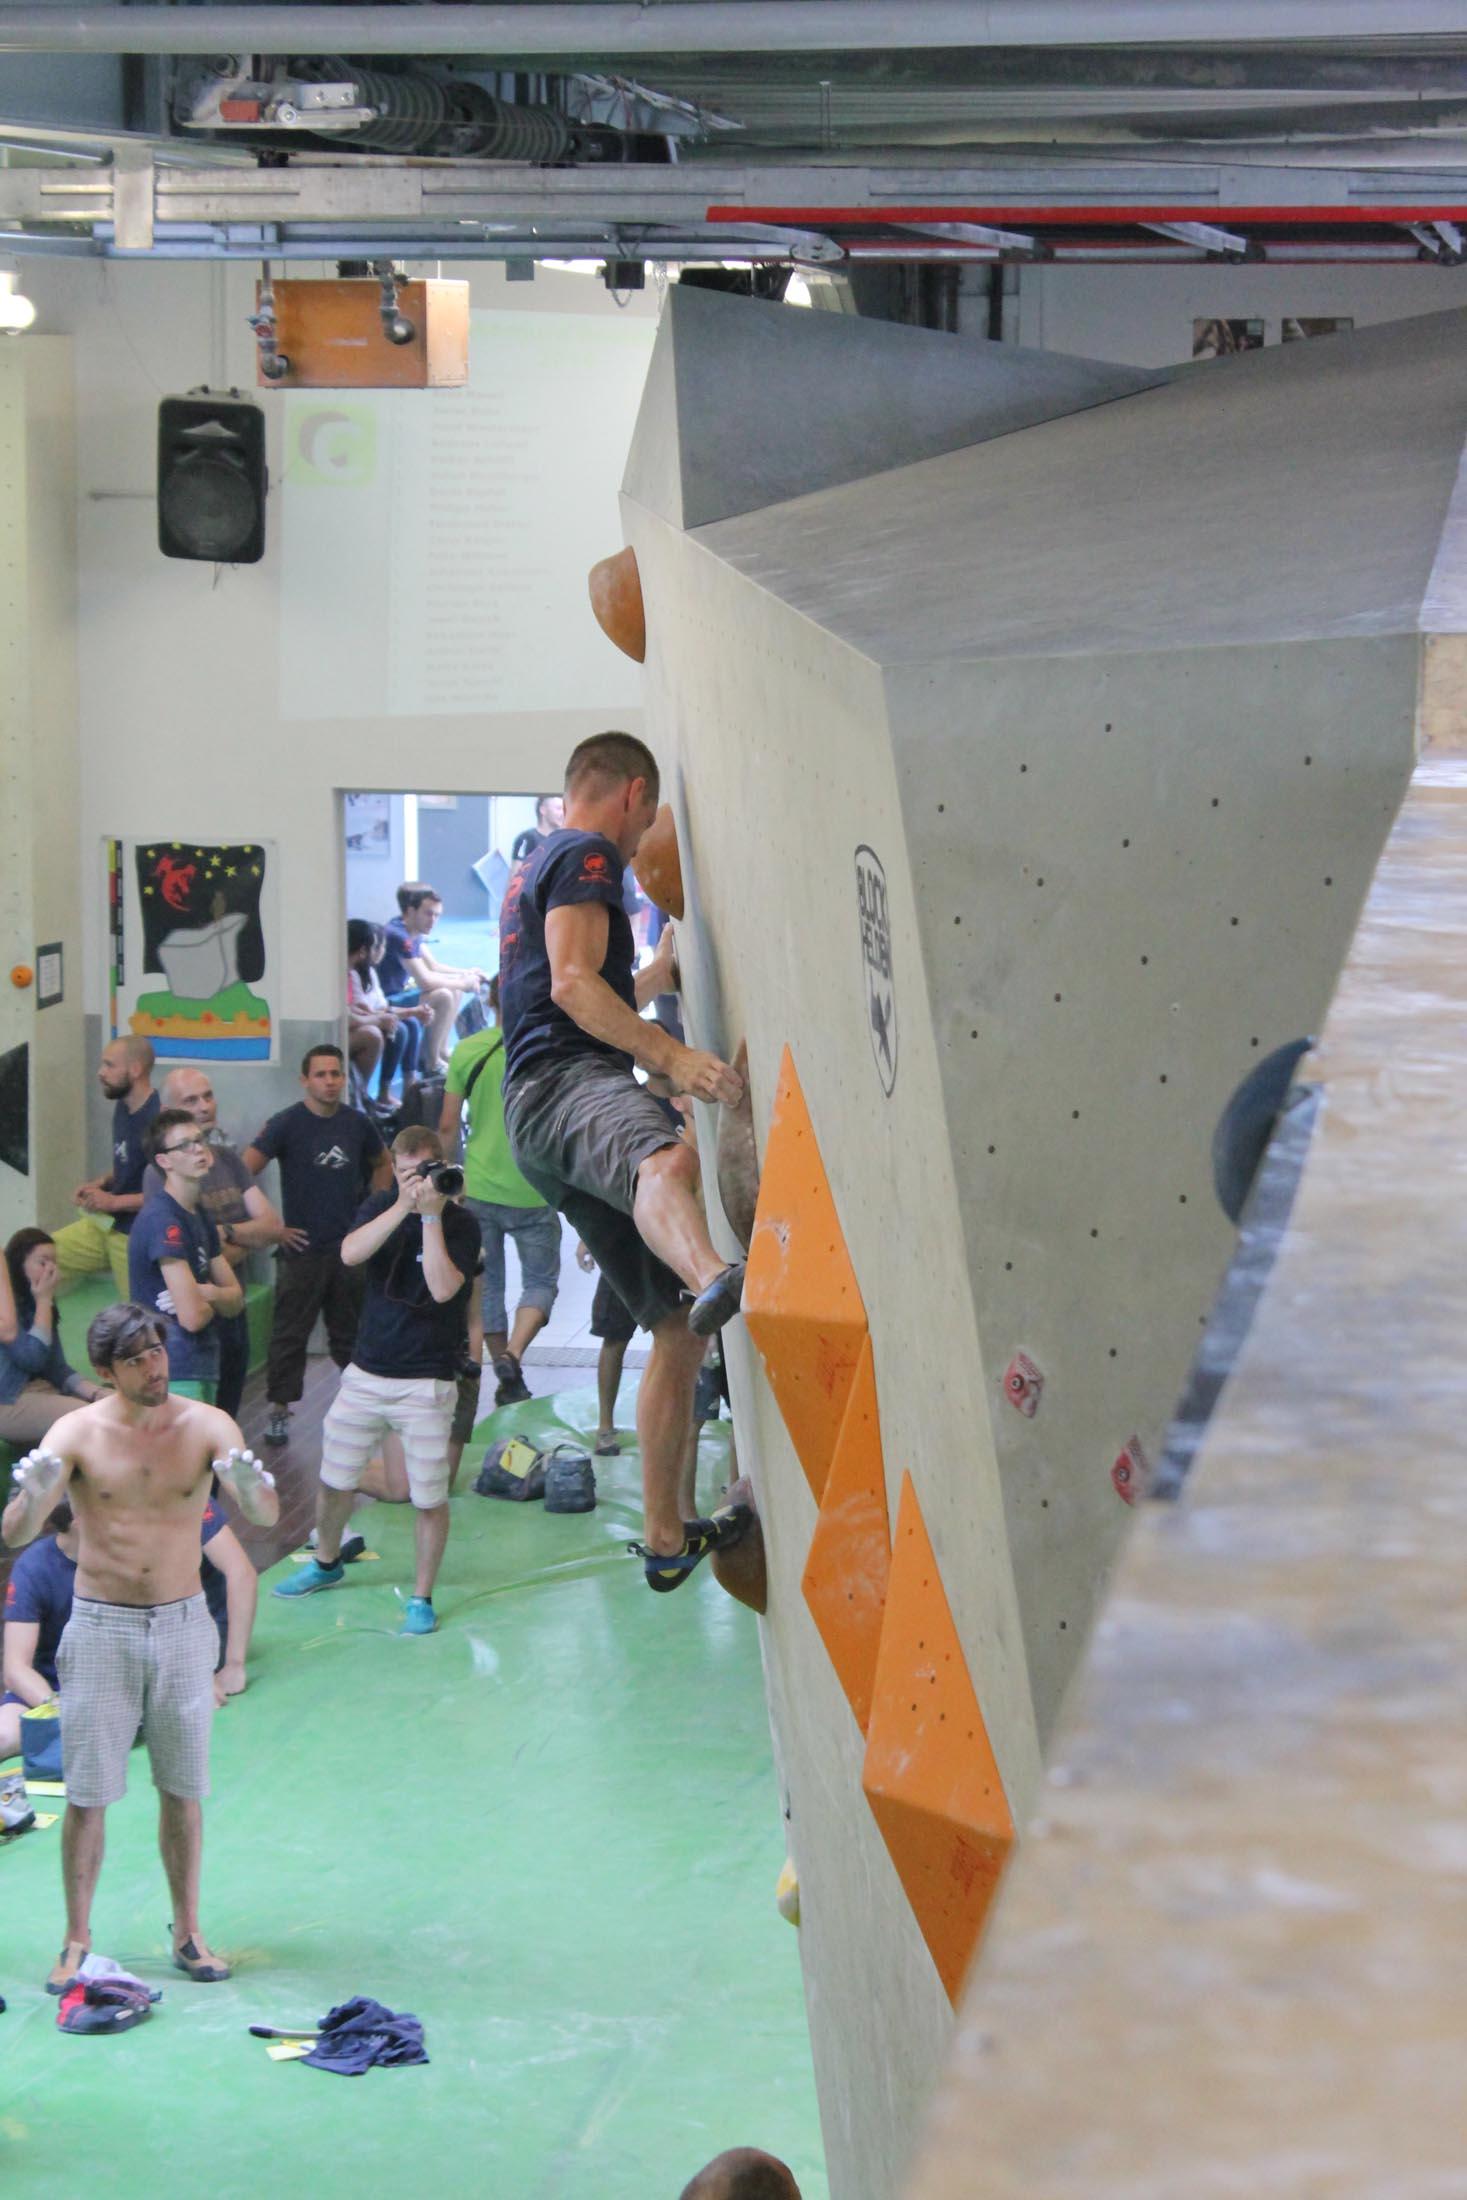 Quali, internationaler bouldercup Frankenjura 2016, BLOCKHELDEN Erlangen, Mammut, Bergfreunde.de, Boulderwettkampf07092016146